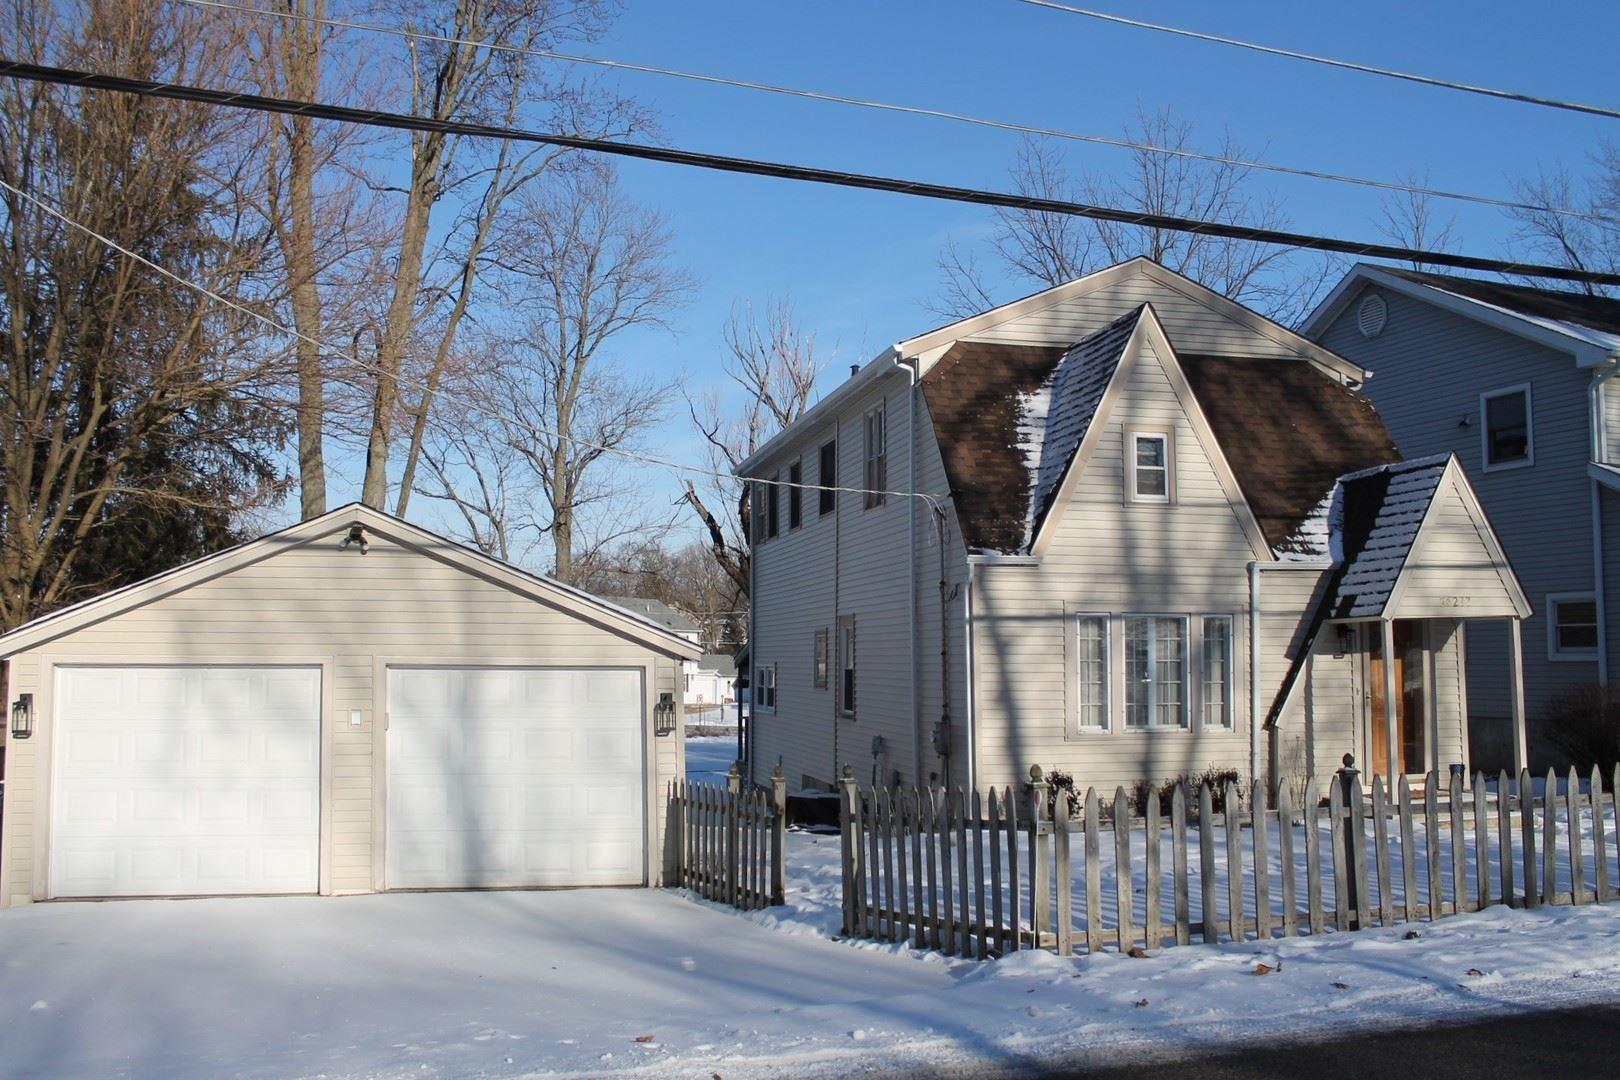 Photo for 26277 N Elmwood Avenue, Mundelein, IL 60060 (MLS # 10976799)